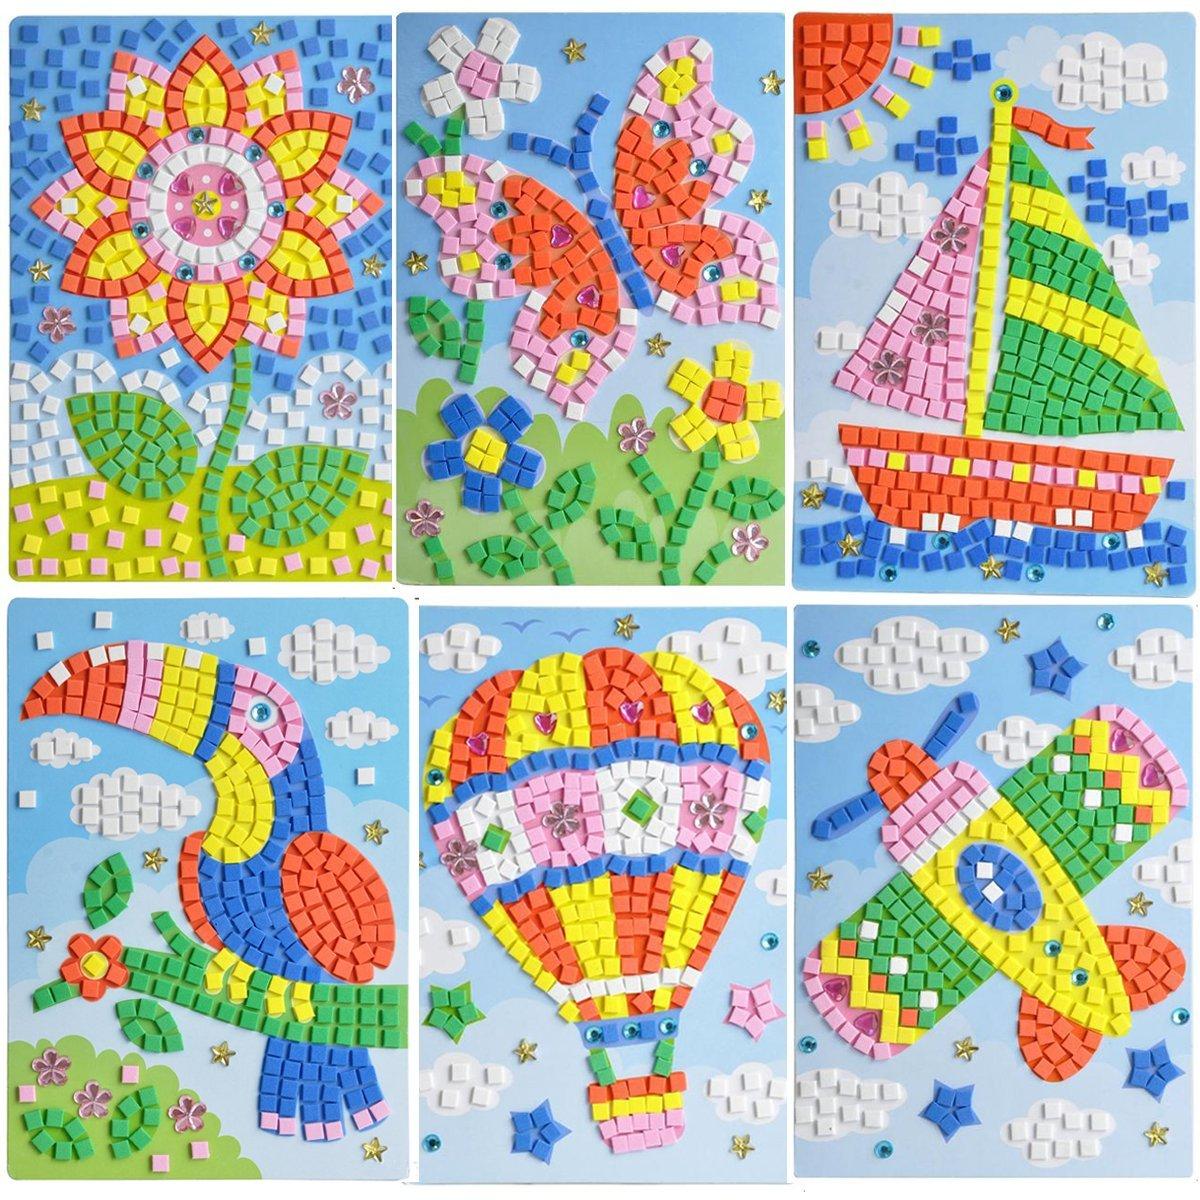 LZHZH Mosaic Sticker Art Kits for Kids Animals Butterfly Sailing Hot Air Balloon Plane Sunflower Sika Deer by LZHZH